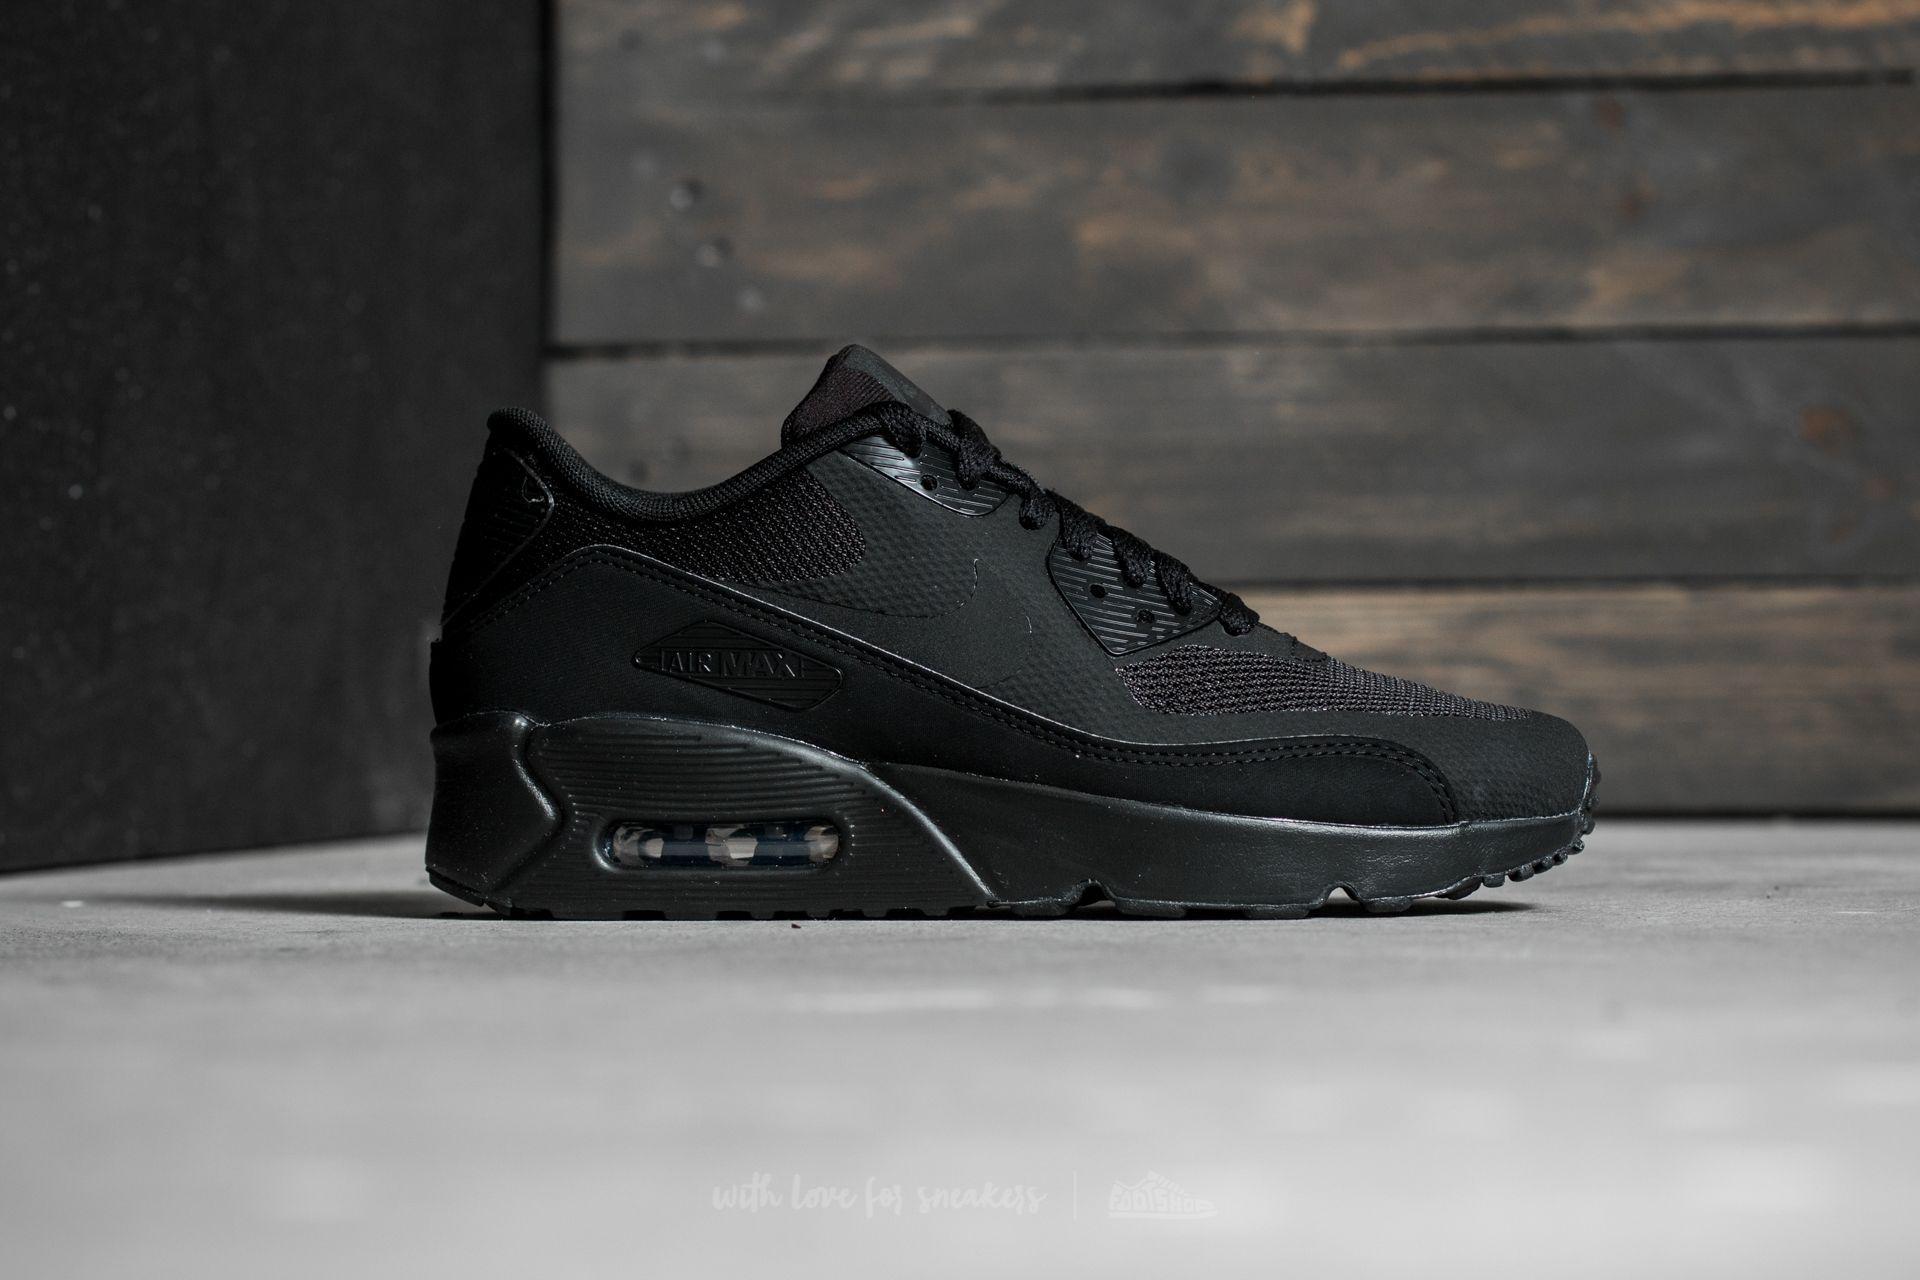 Embrión cocodrilo masculino  Women's shoes Nike Air Max 90 Ultra 2.0 (GS) Black/ Black-Black